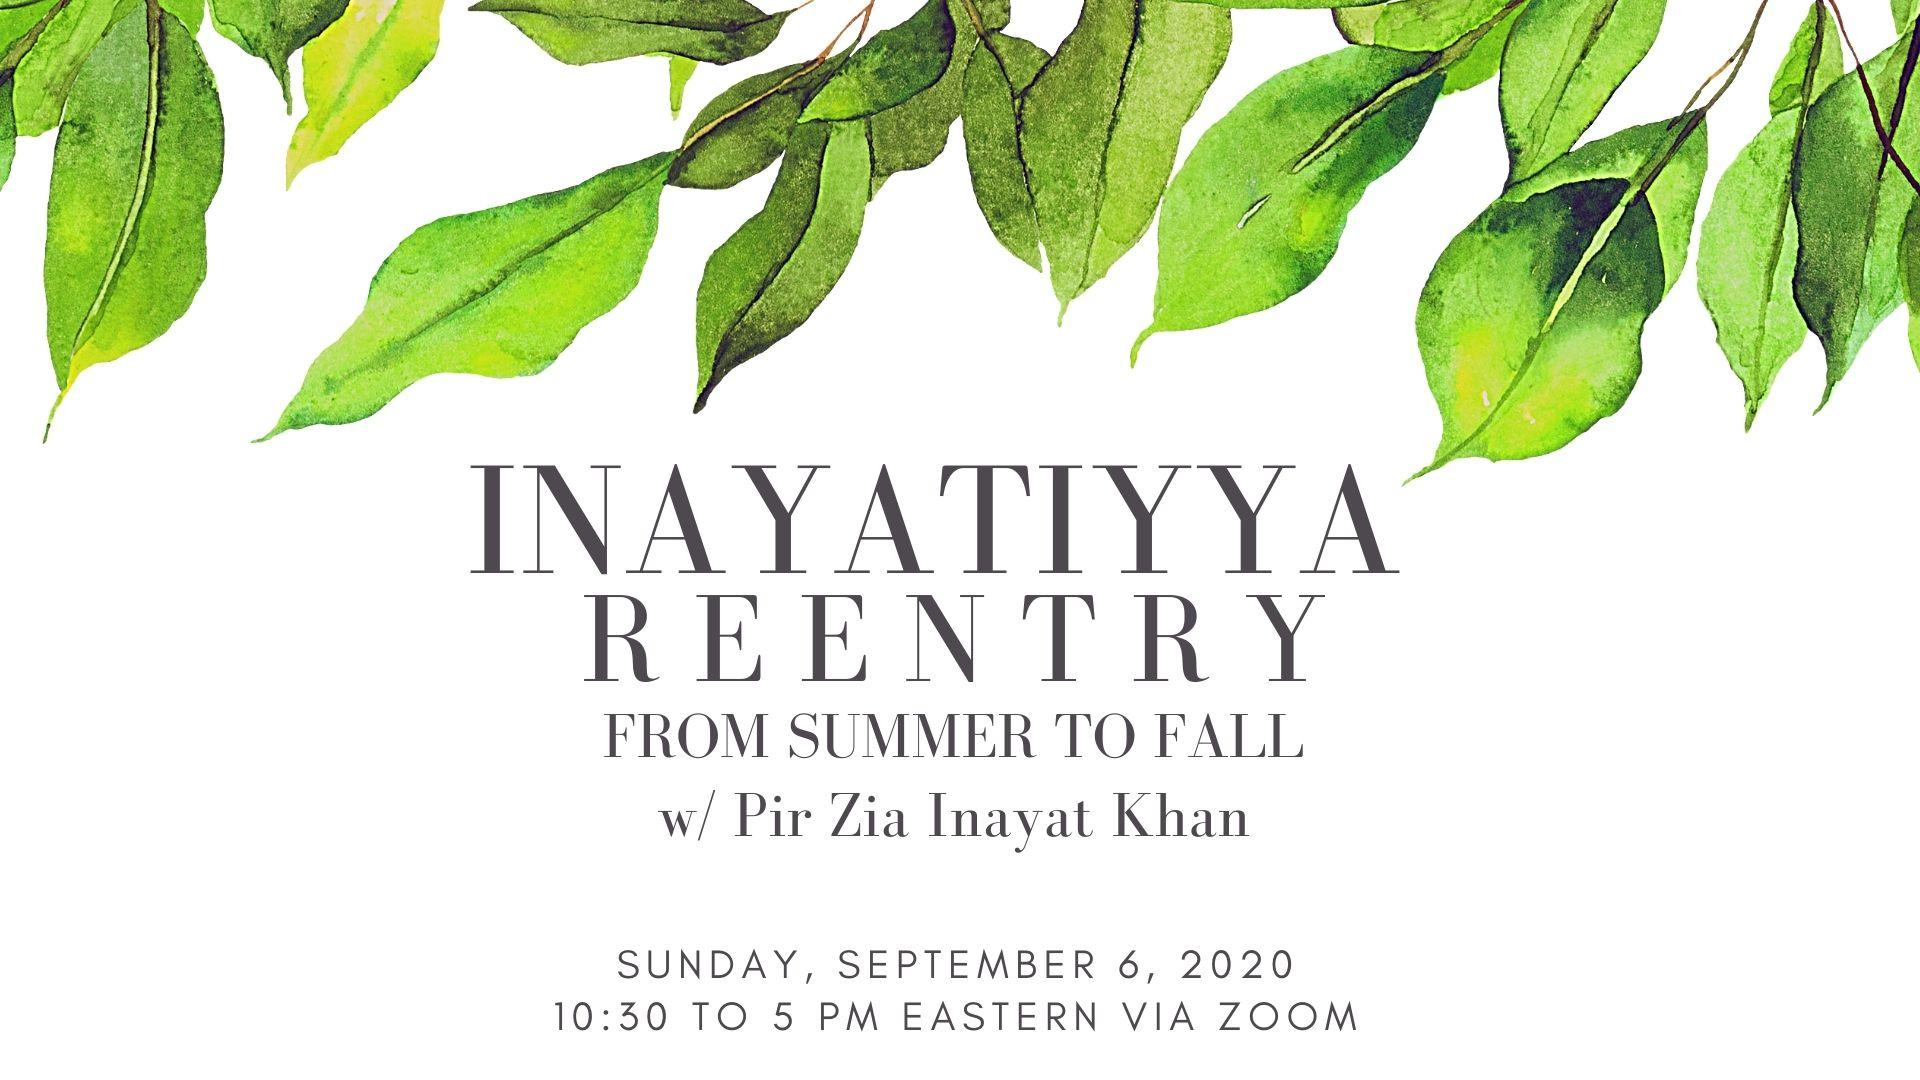 Inayatiyya Reentry: From Summer to Fall w/ Pir Zia Inayat Khan